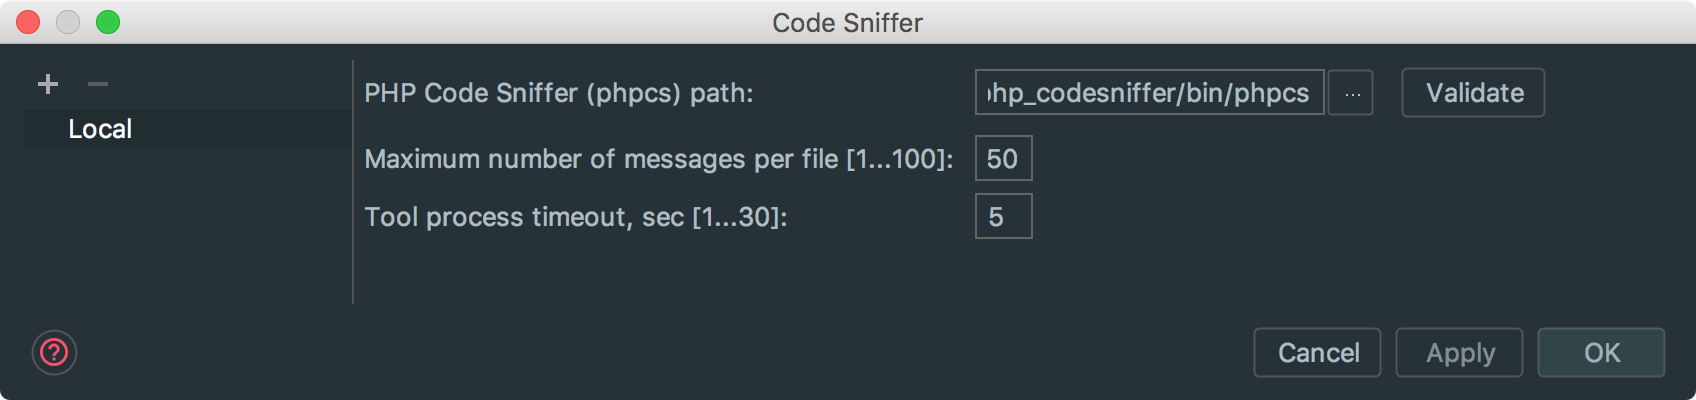 Code Sniffer Installation Path